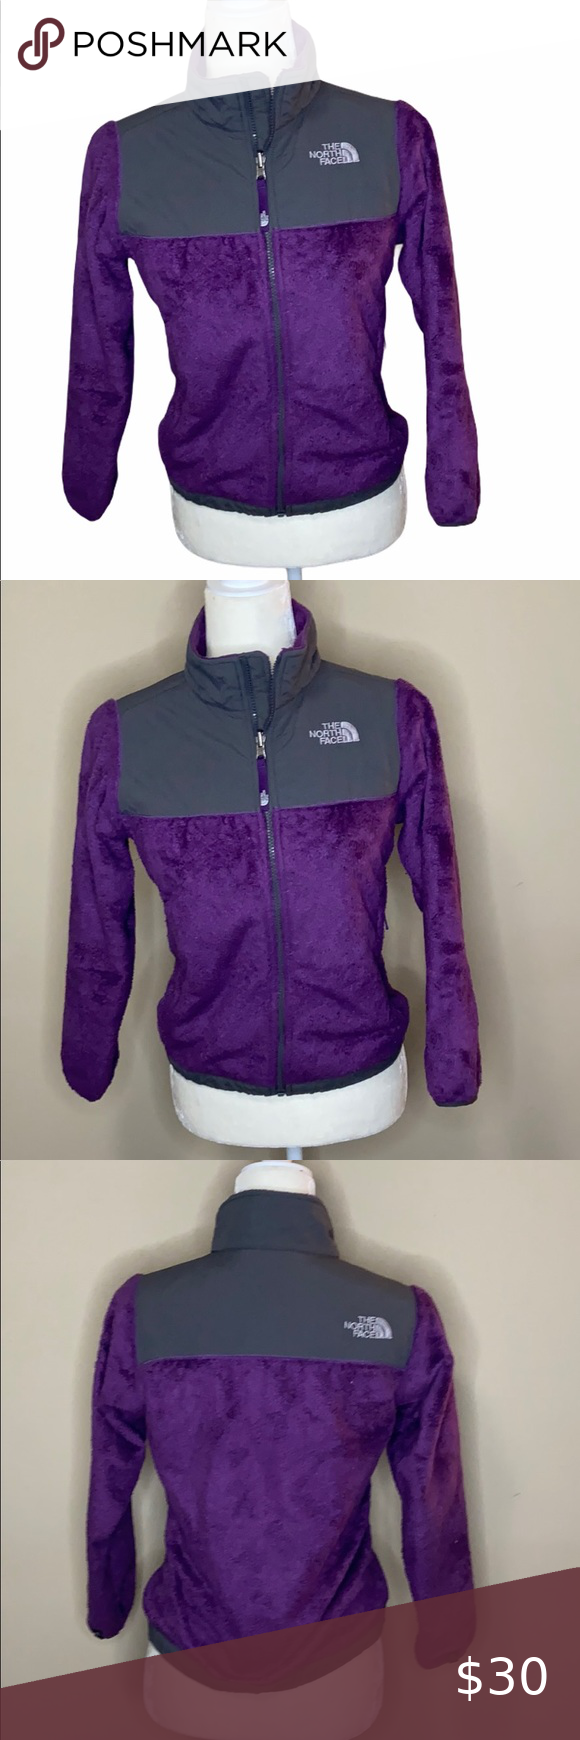 The Northface Osito Purple Jacket Kids North Face Jackets Purple Jacket North Face Jacket [ 1740 x 580 Pixel ]